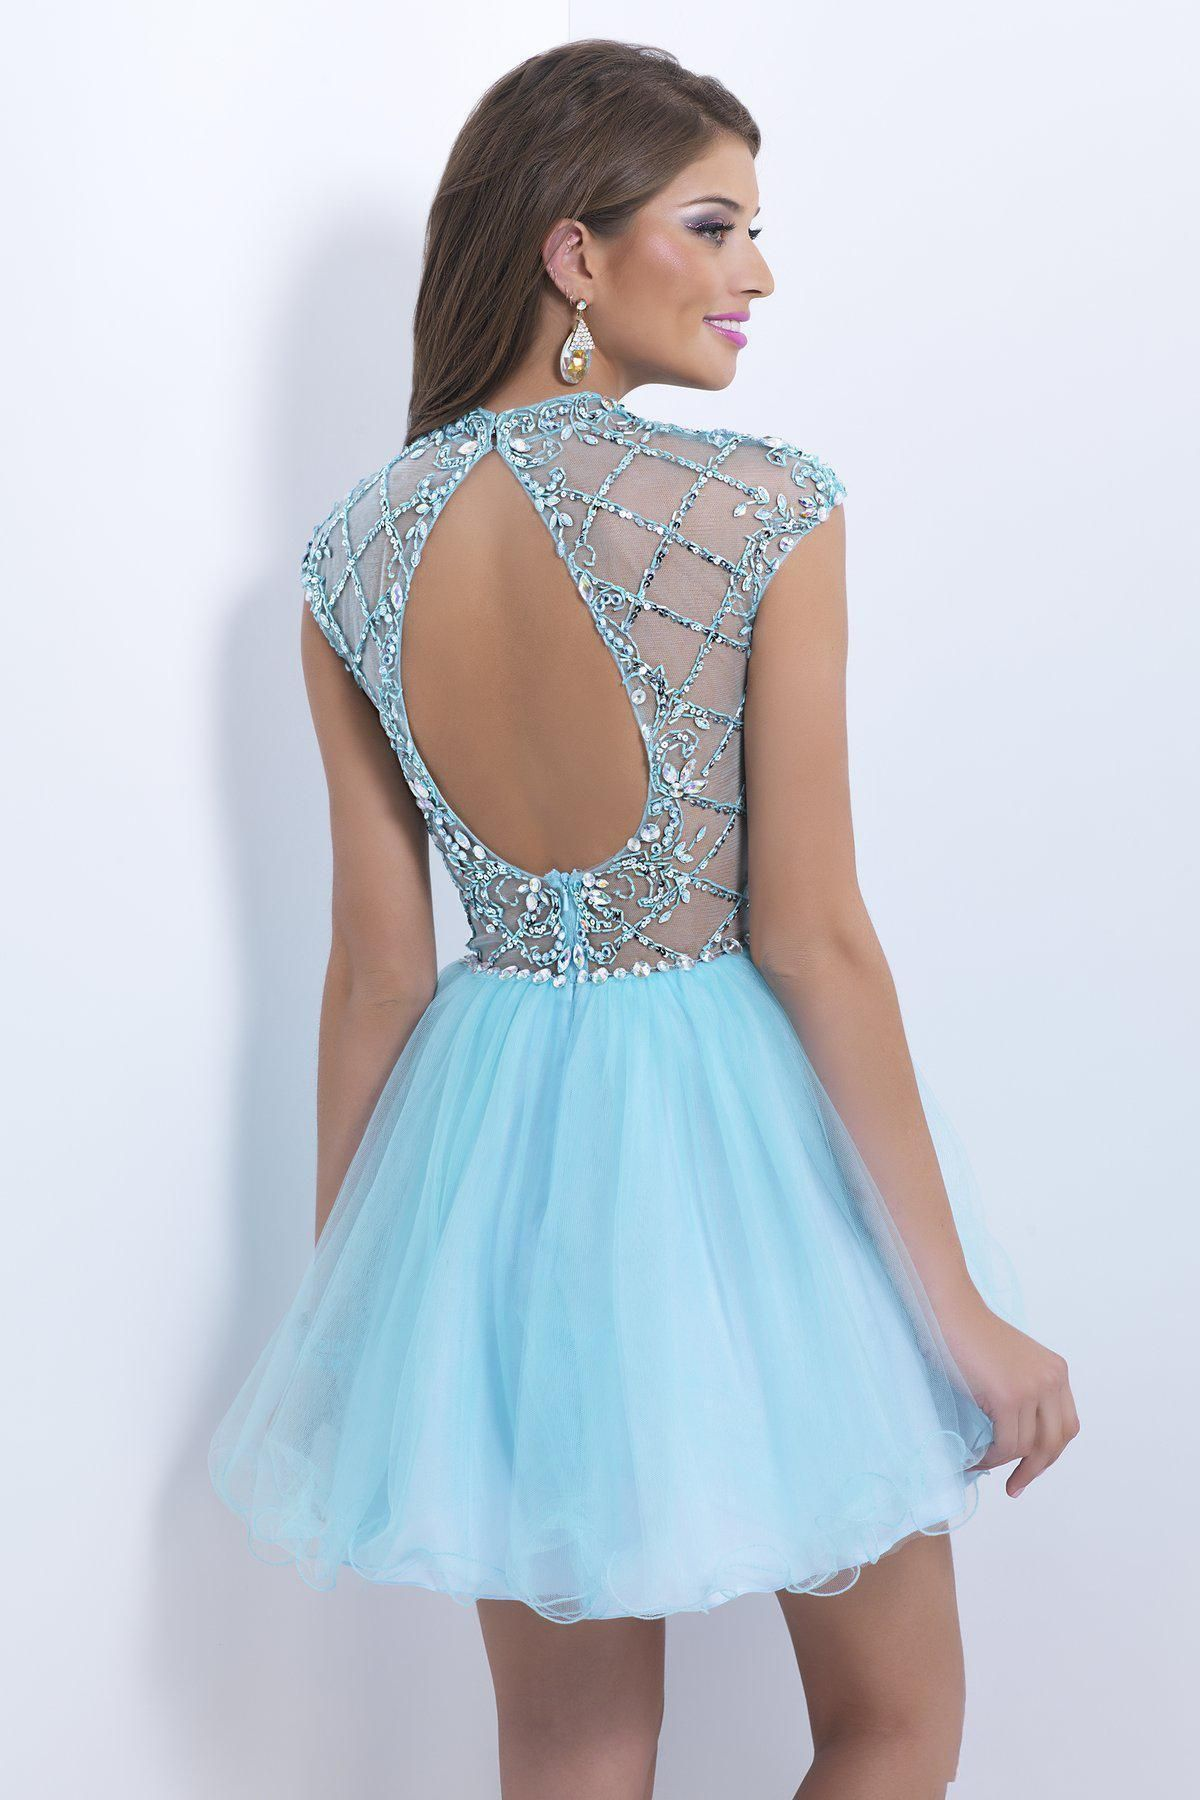 Th Grade Prom Dresses fashion in Pinterest Prom Fancy